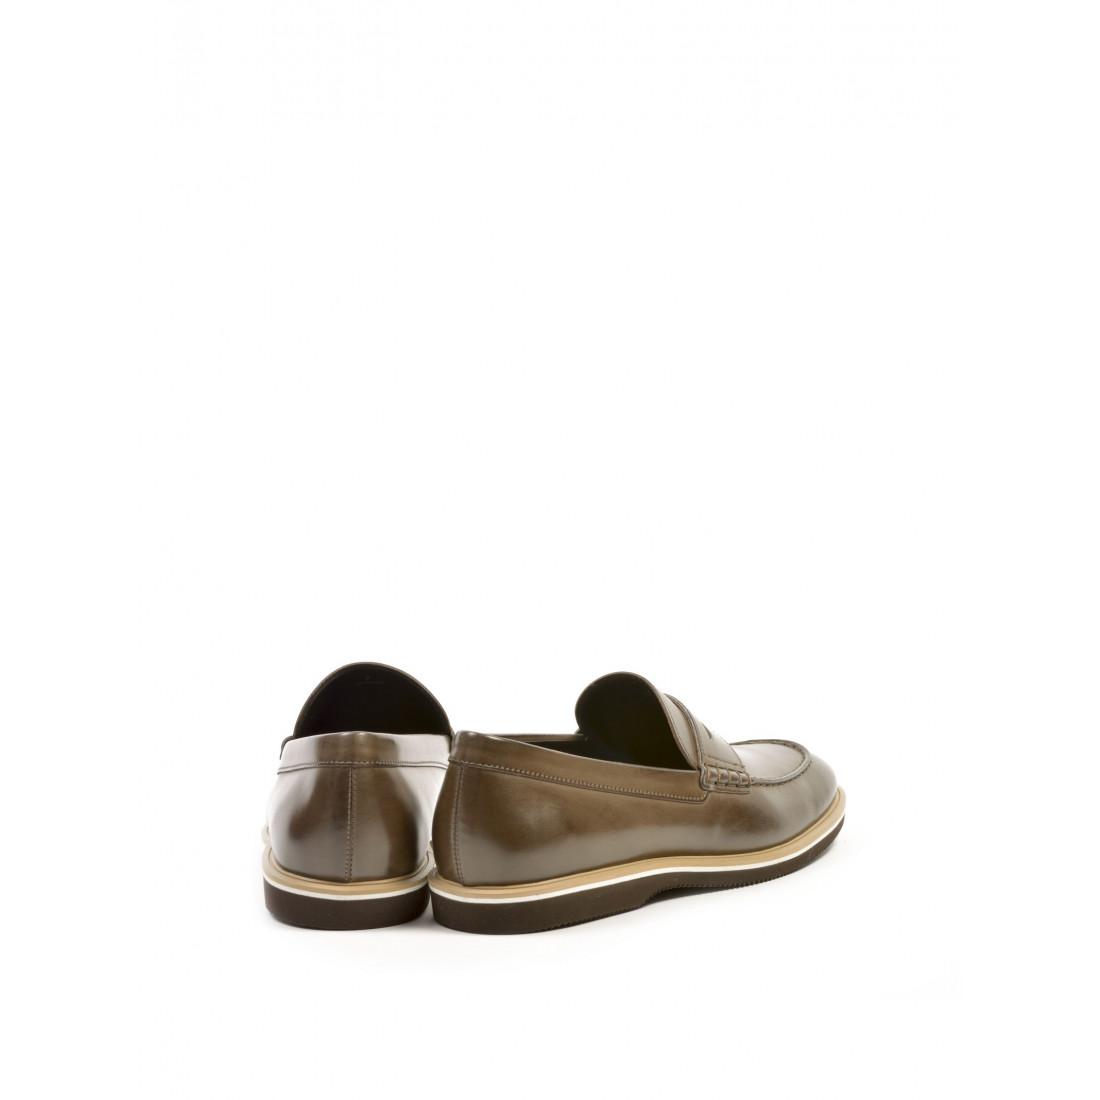 loafers man hogan hxm2620r7308a1s808